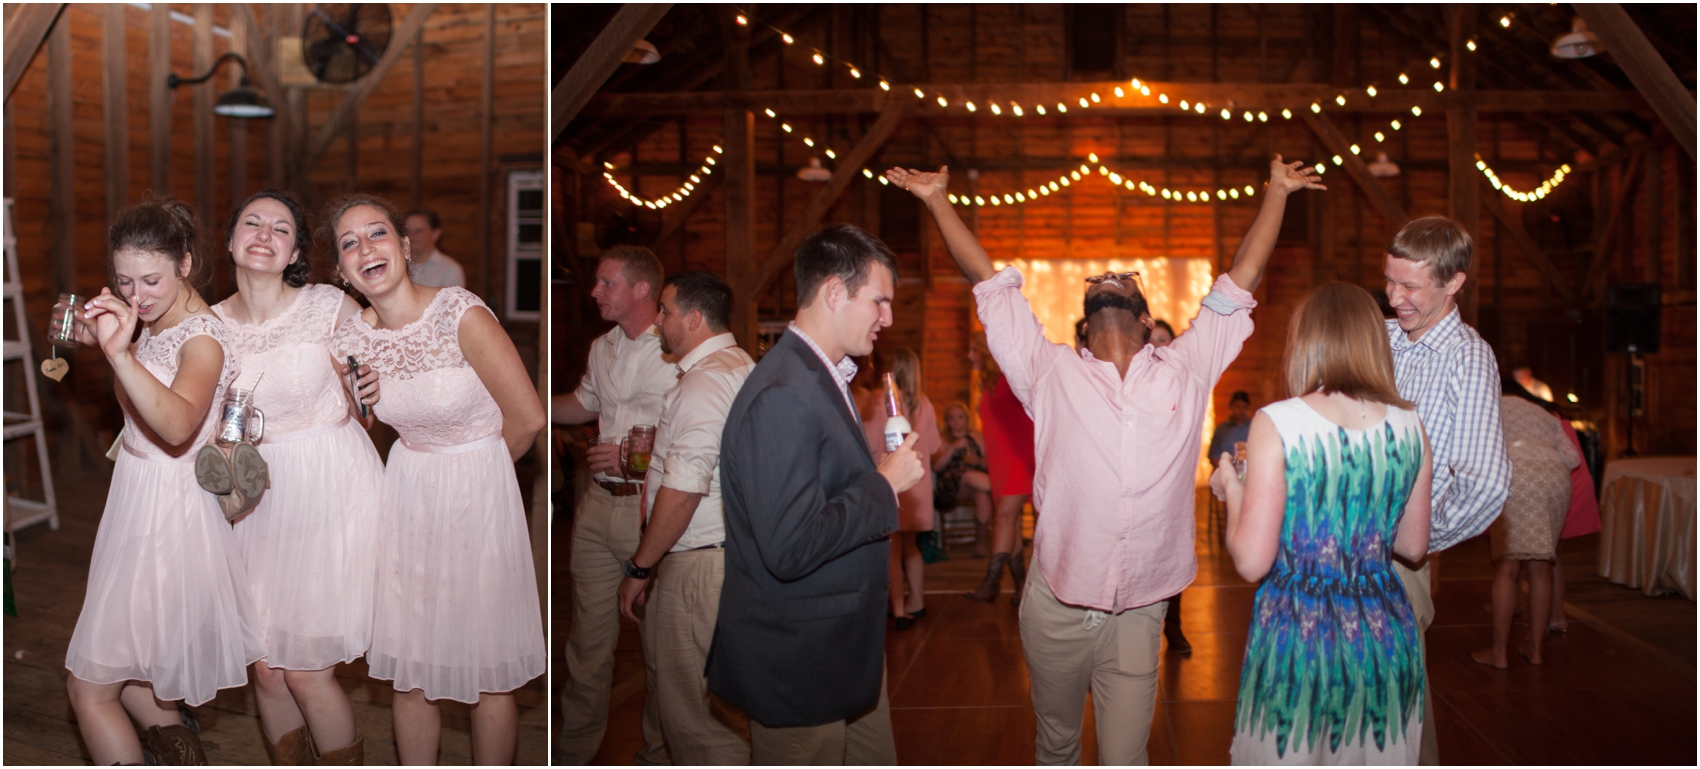 Rodes Farm Charlottesville VA Wedding-2.jpg